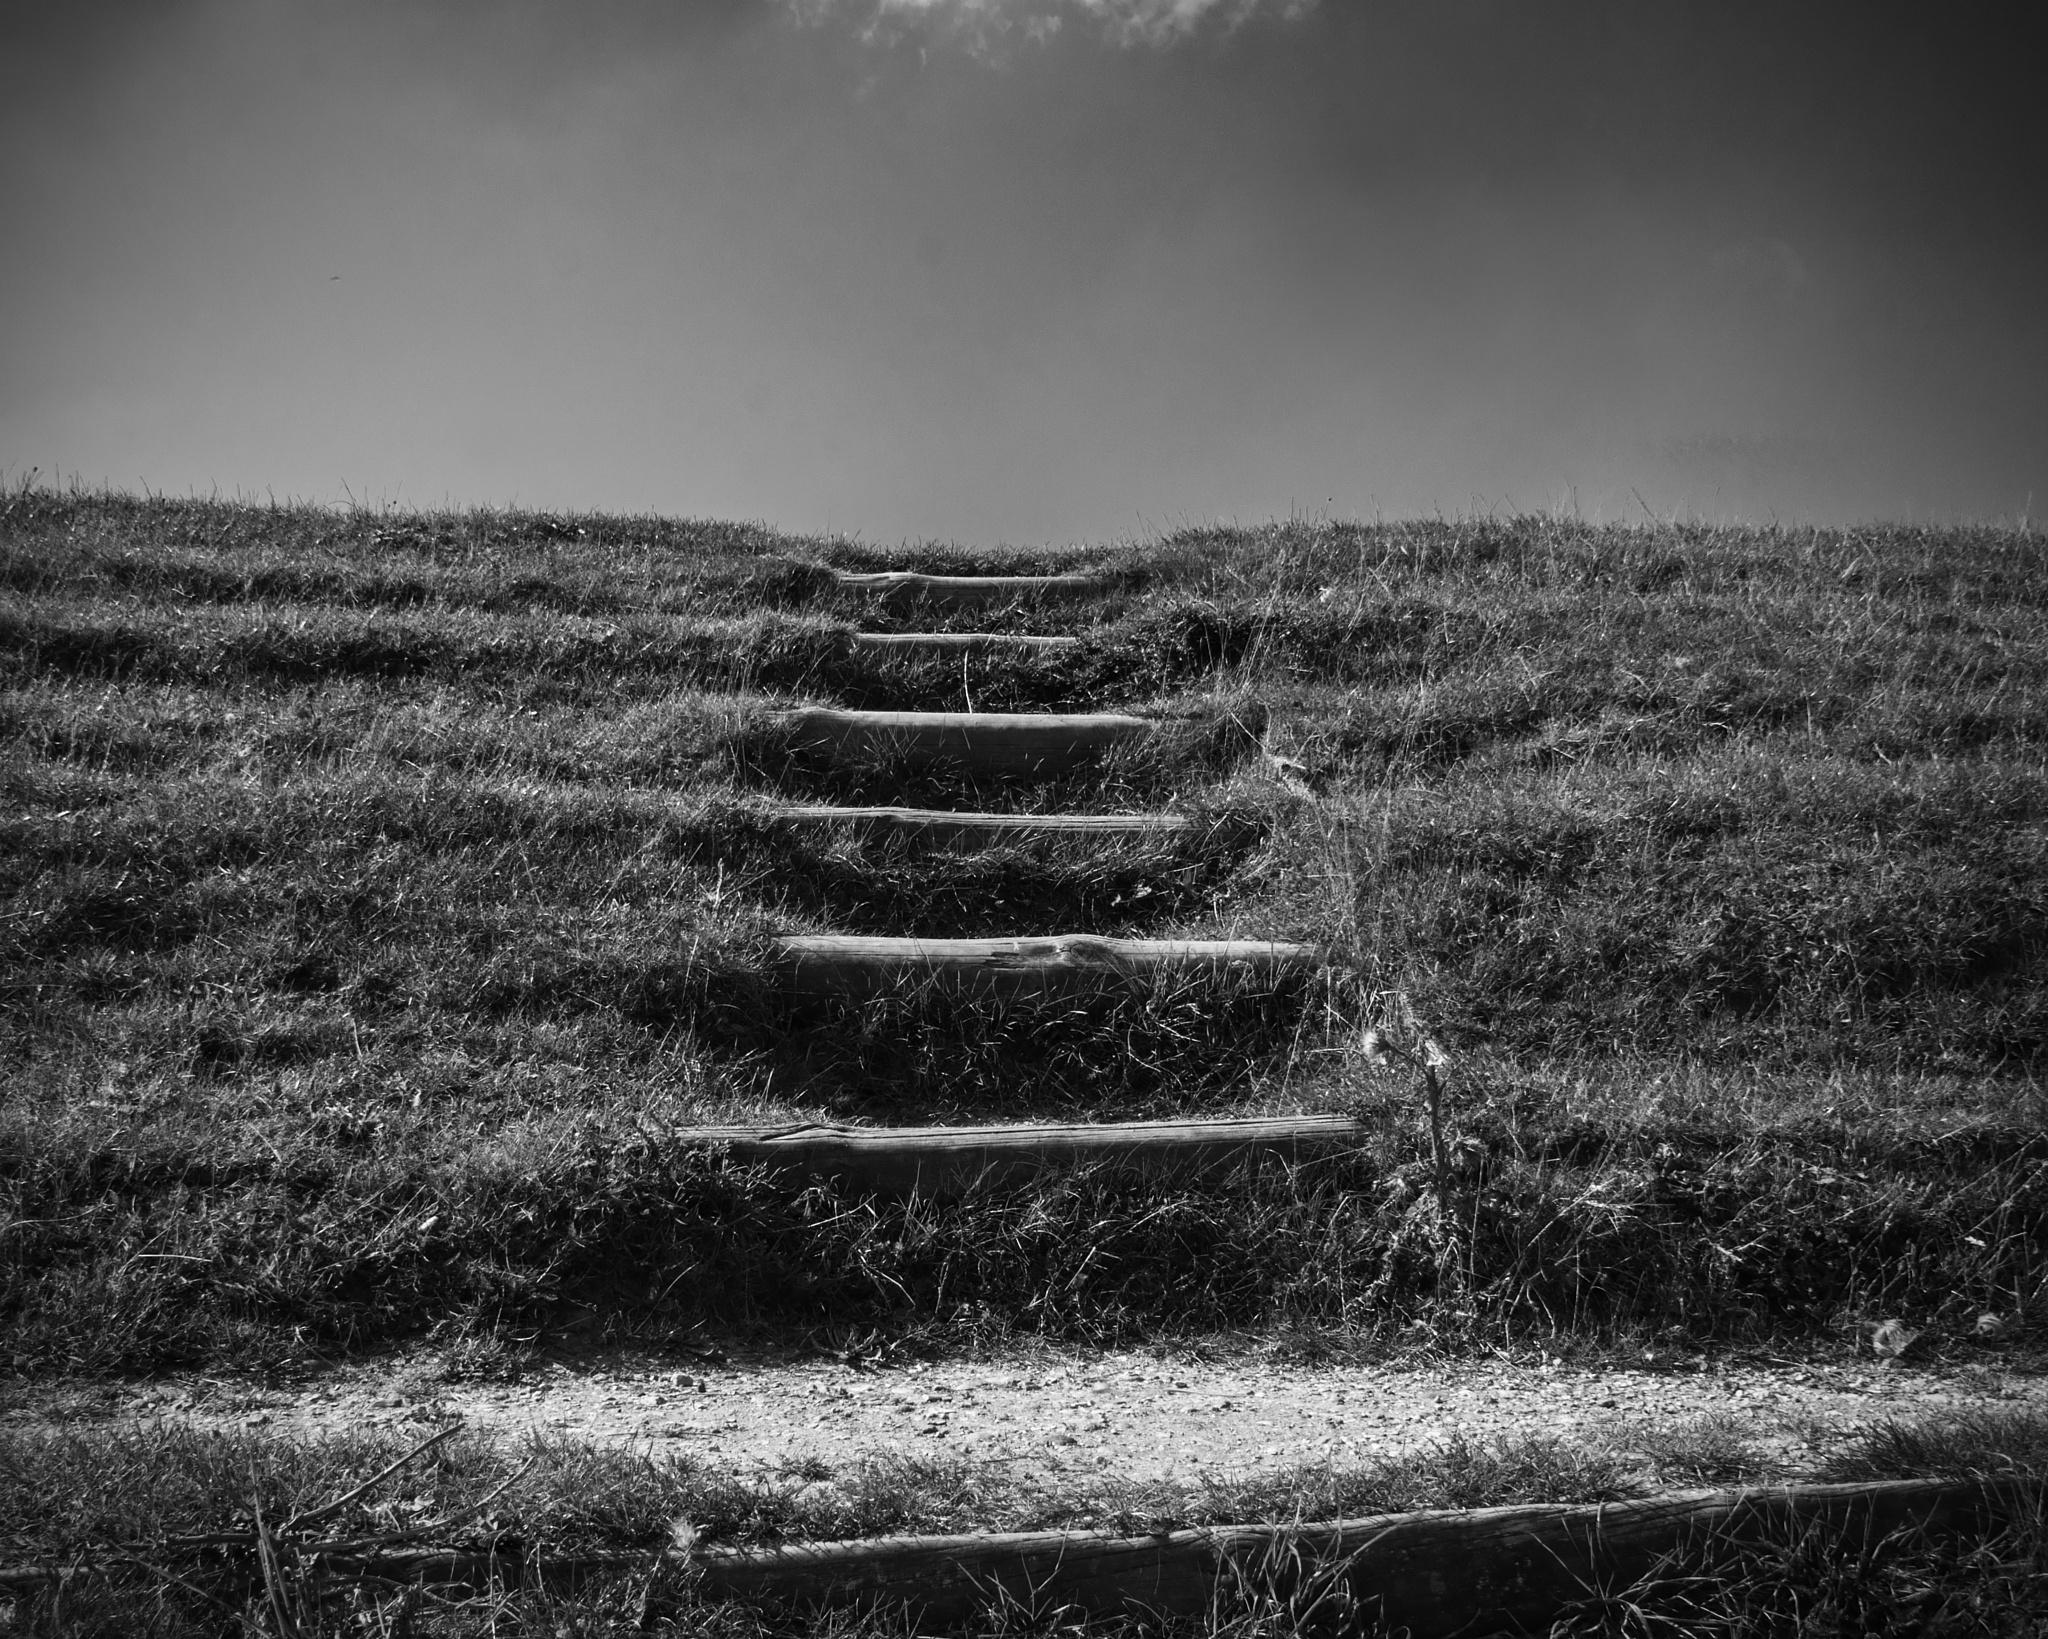 Follow the Dream by BrianS